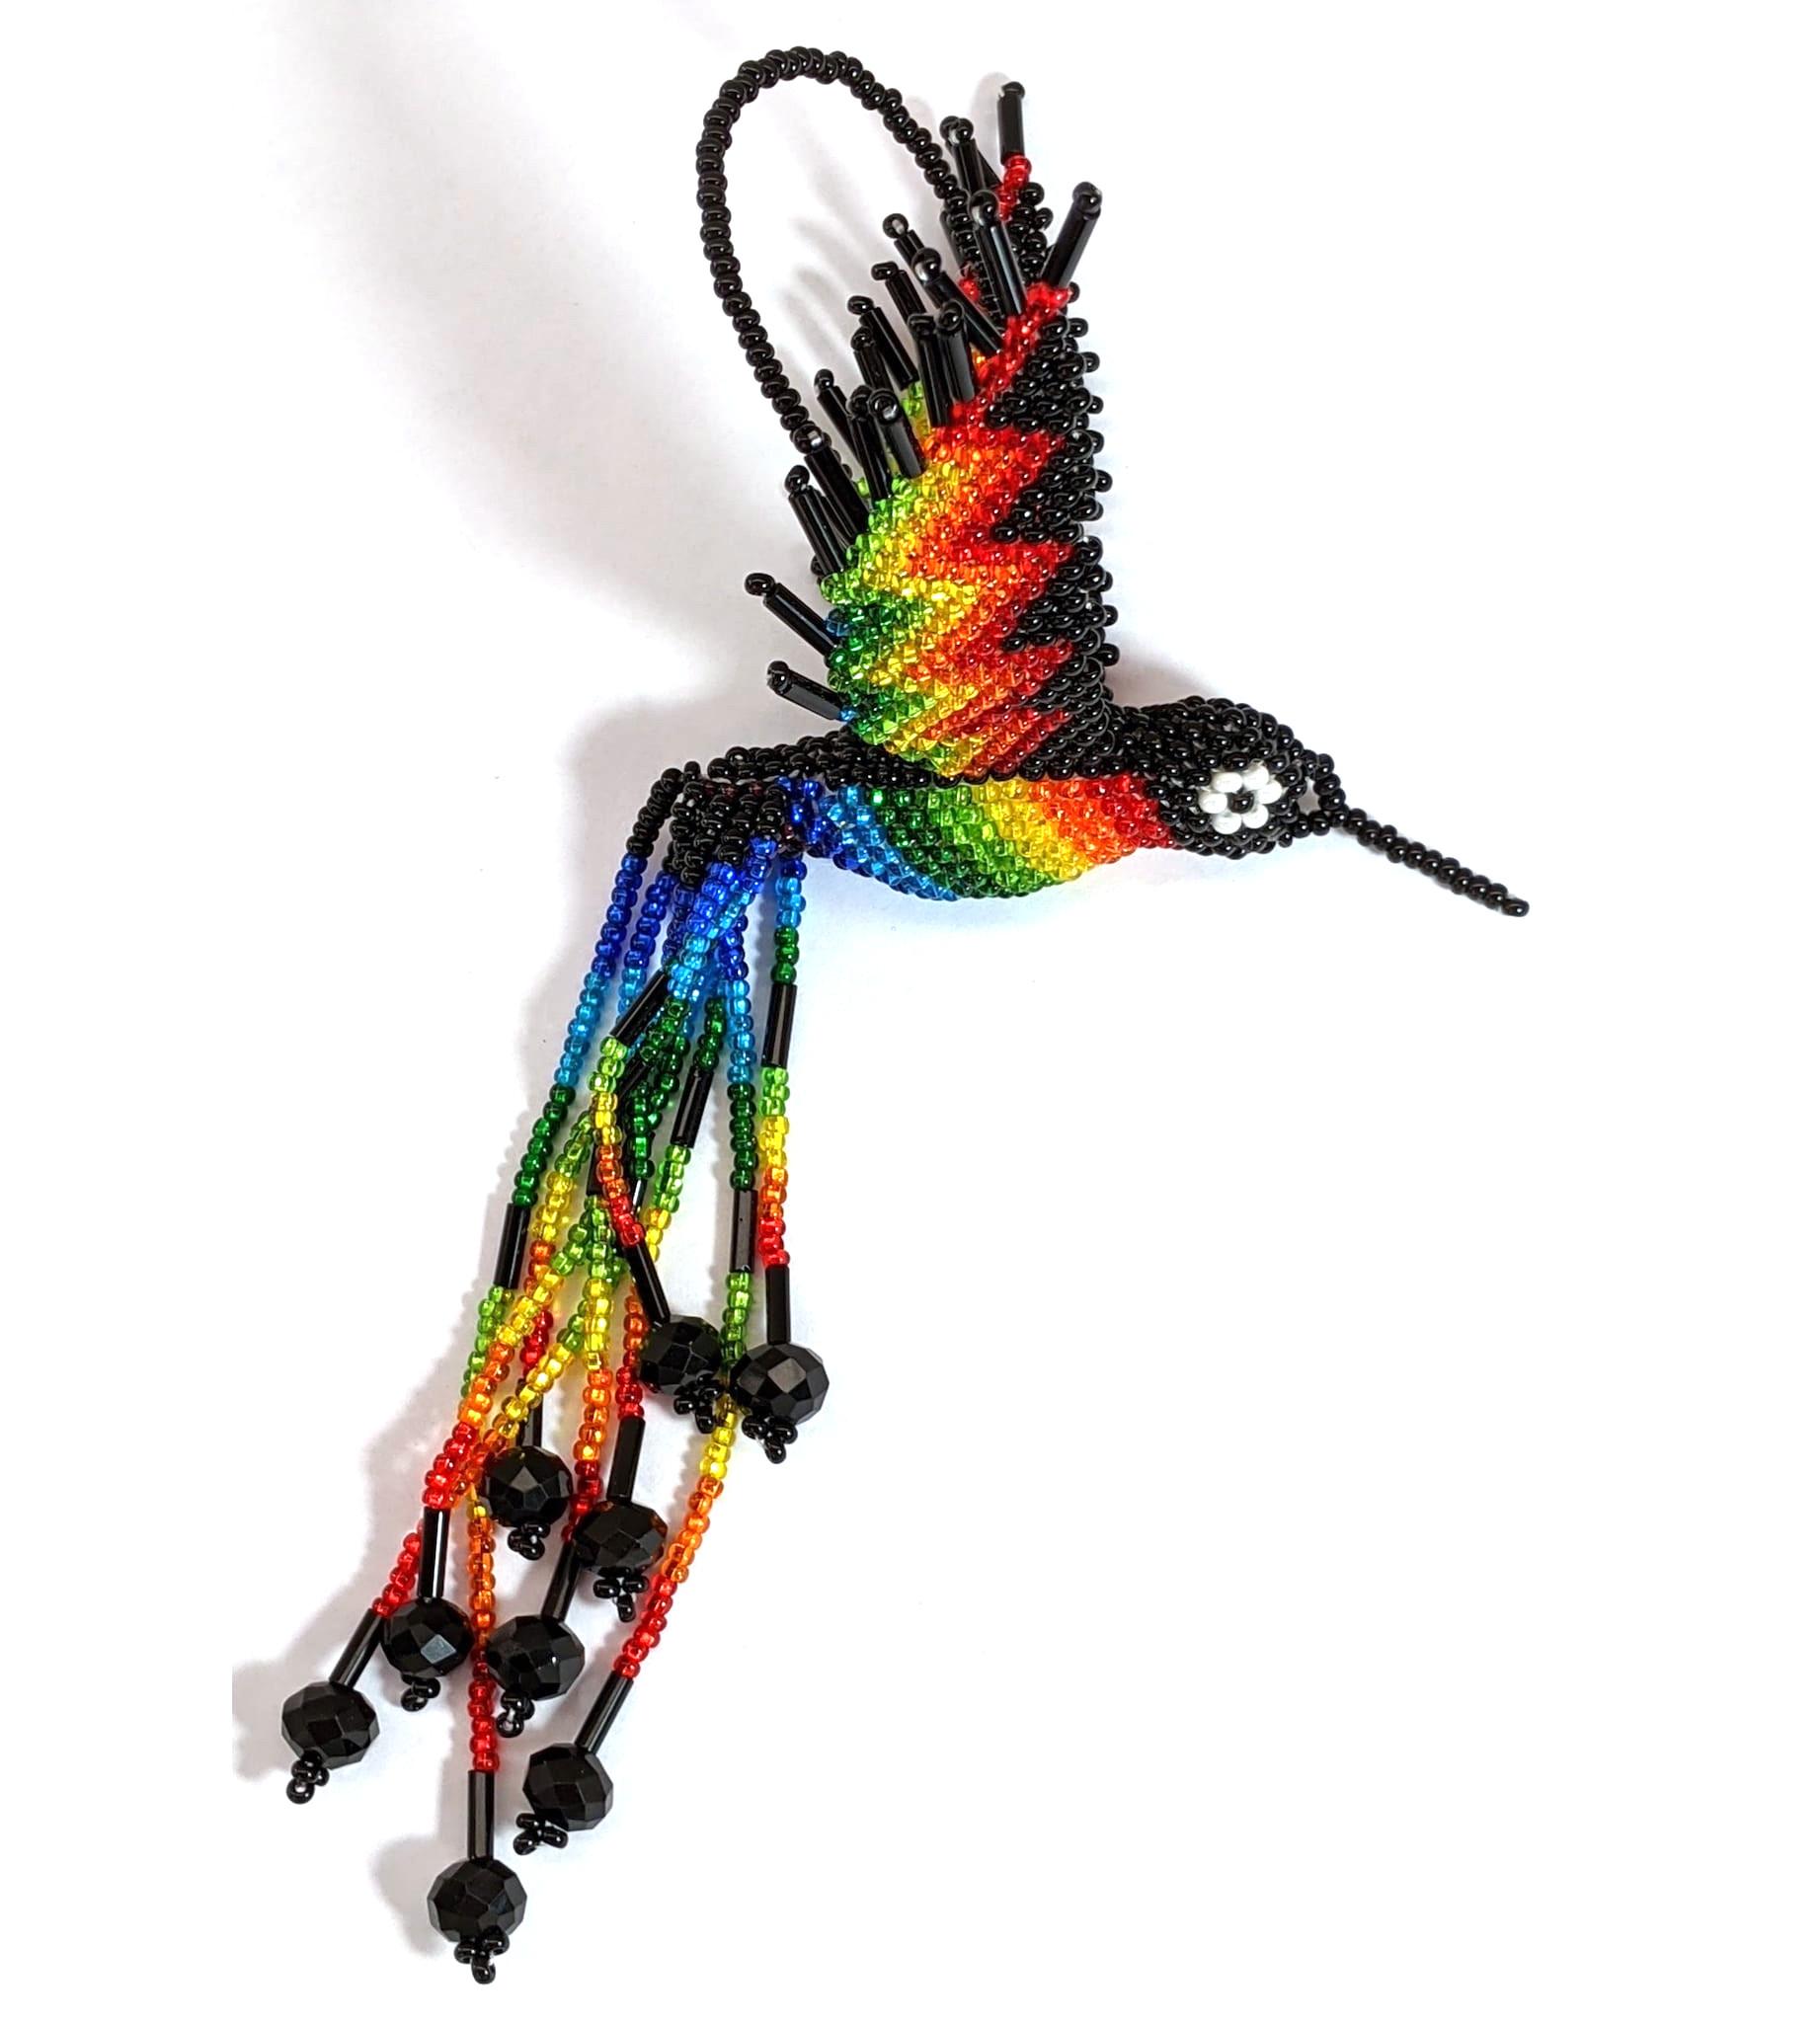 Hummingbird Beaded Ornament - Rainbow with Black